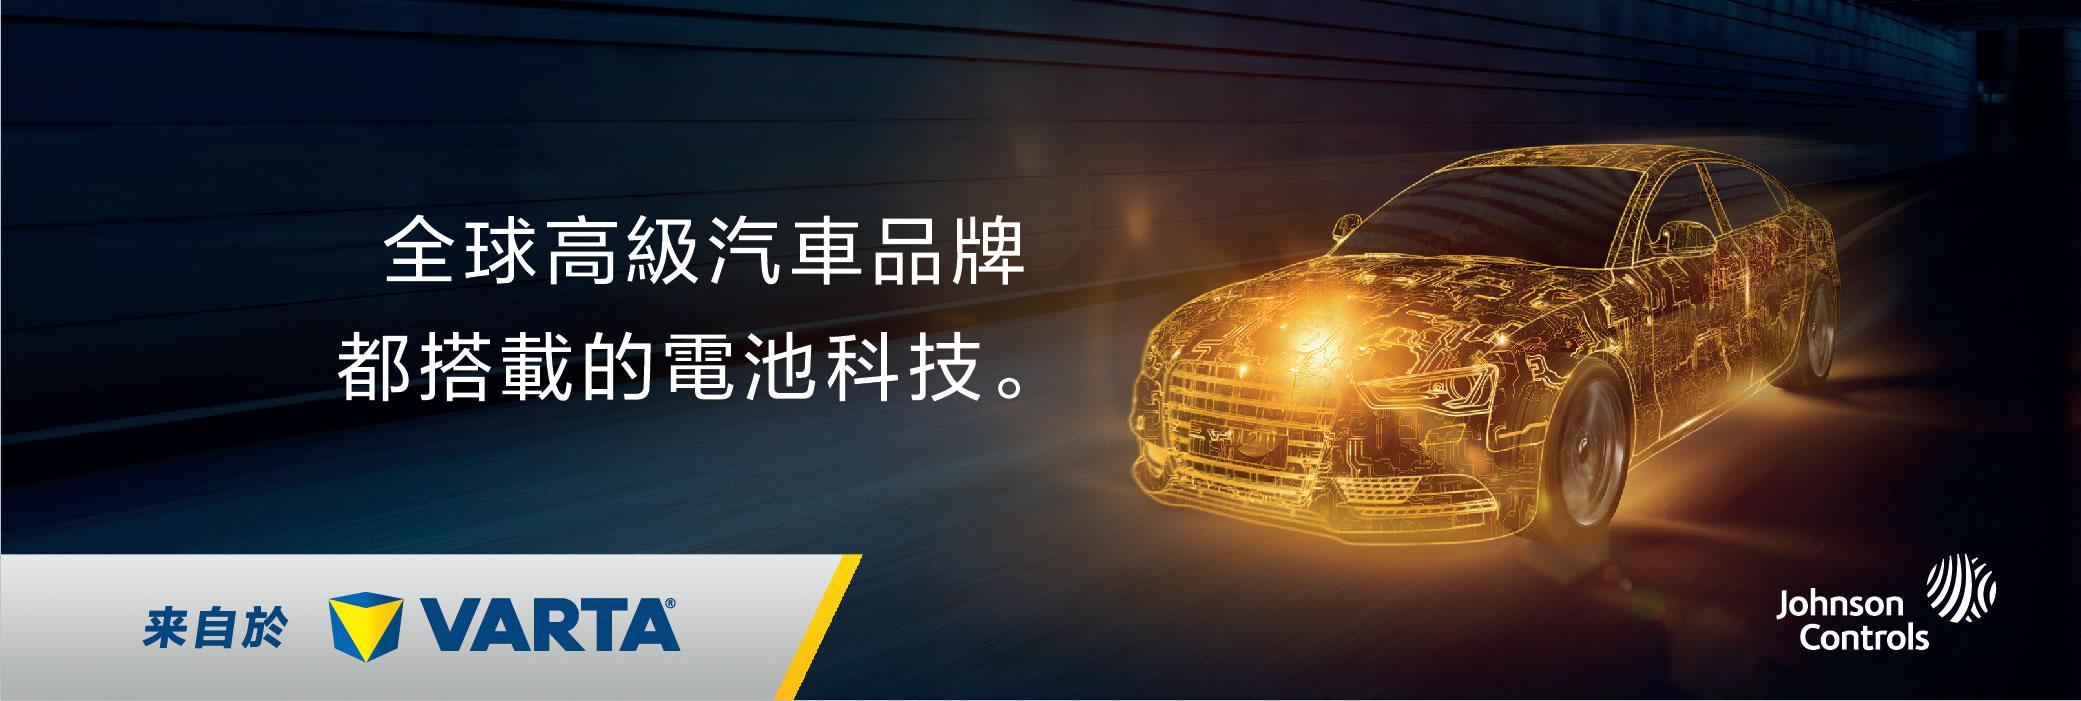 Varta_web_banner_Chi_FA_final_OL.jpg